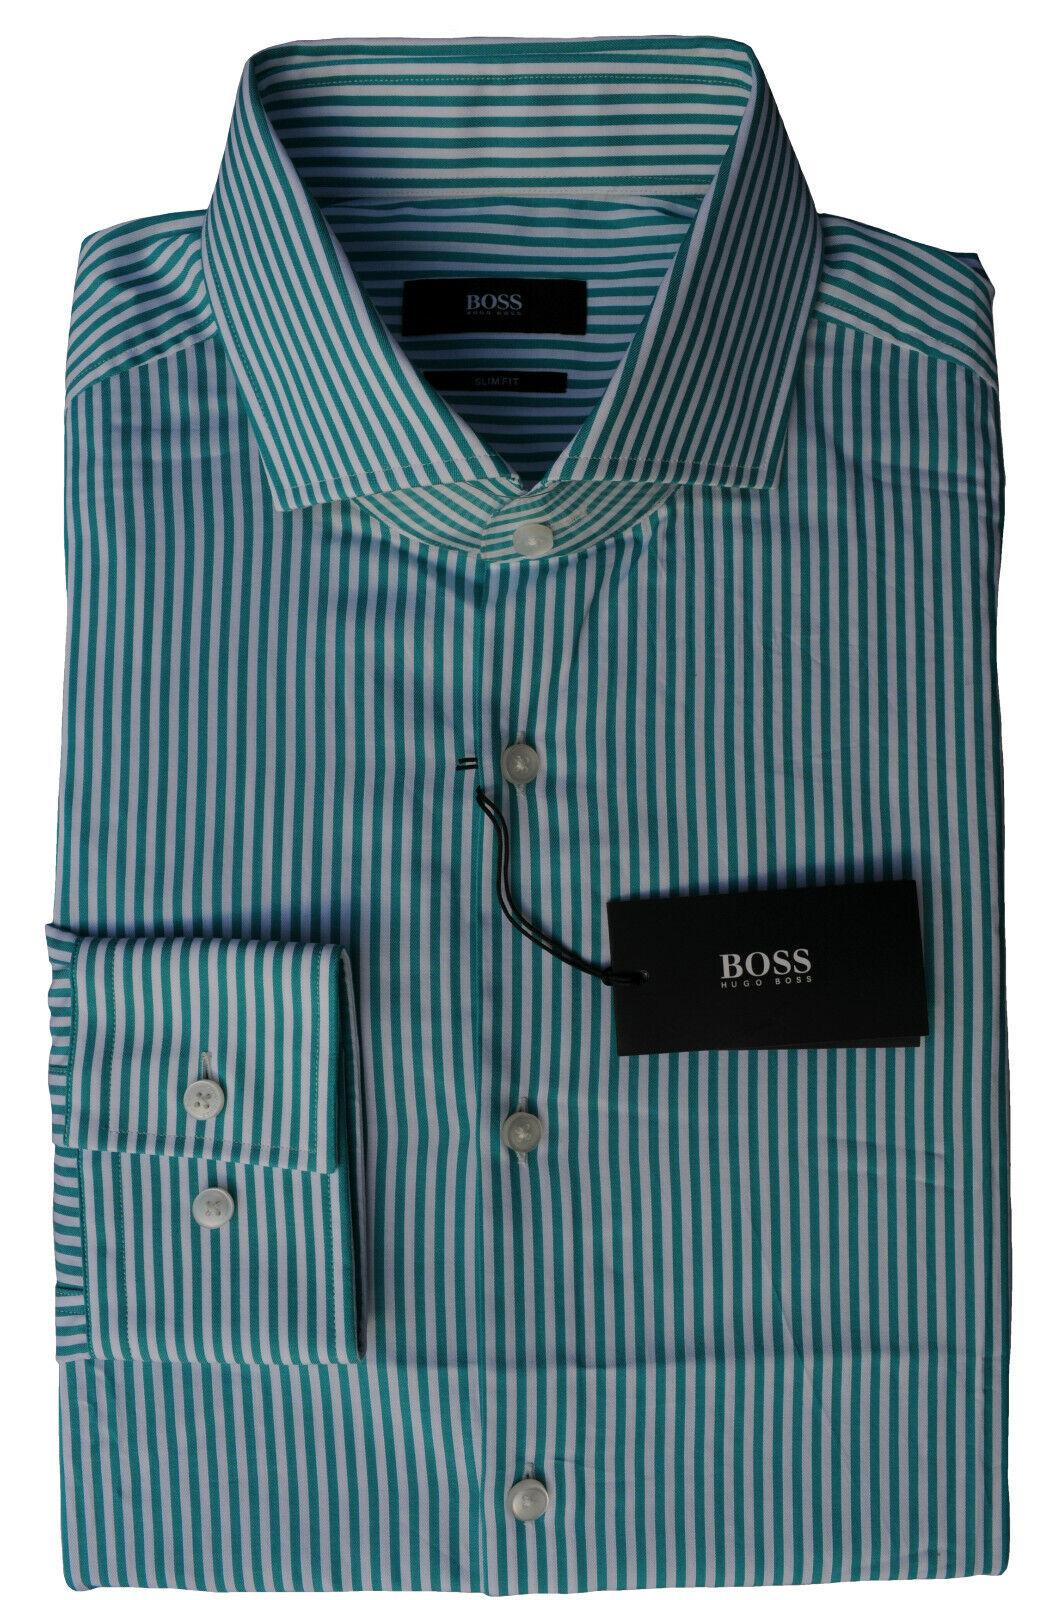 NEU gr. 40 HUGO BOSS JJASON HEMD SLIM FIT OPEN-Grün zu Jeans 50331285 | Stilvoll und lustig